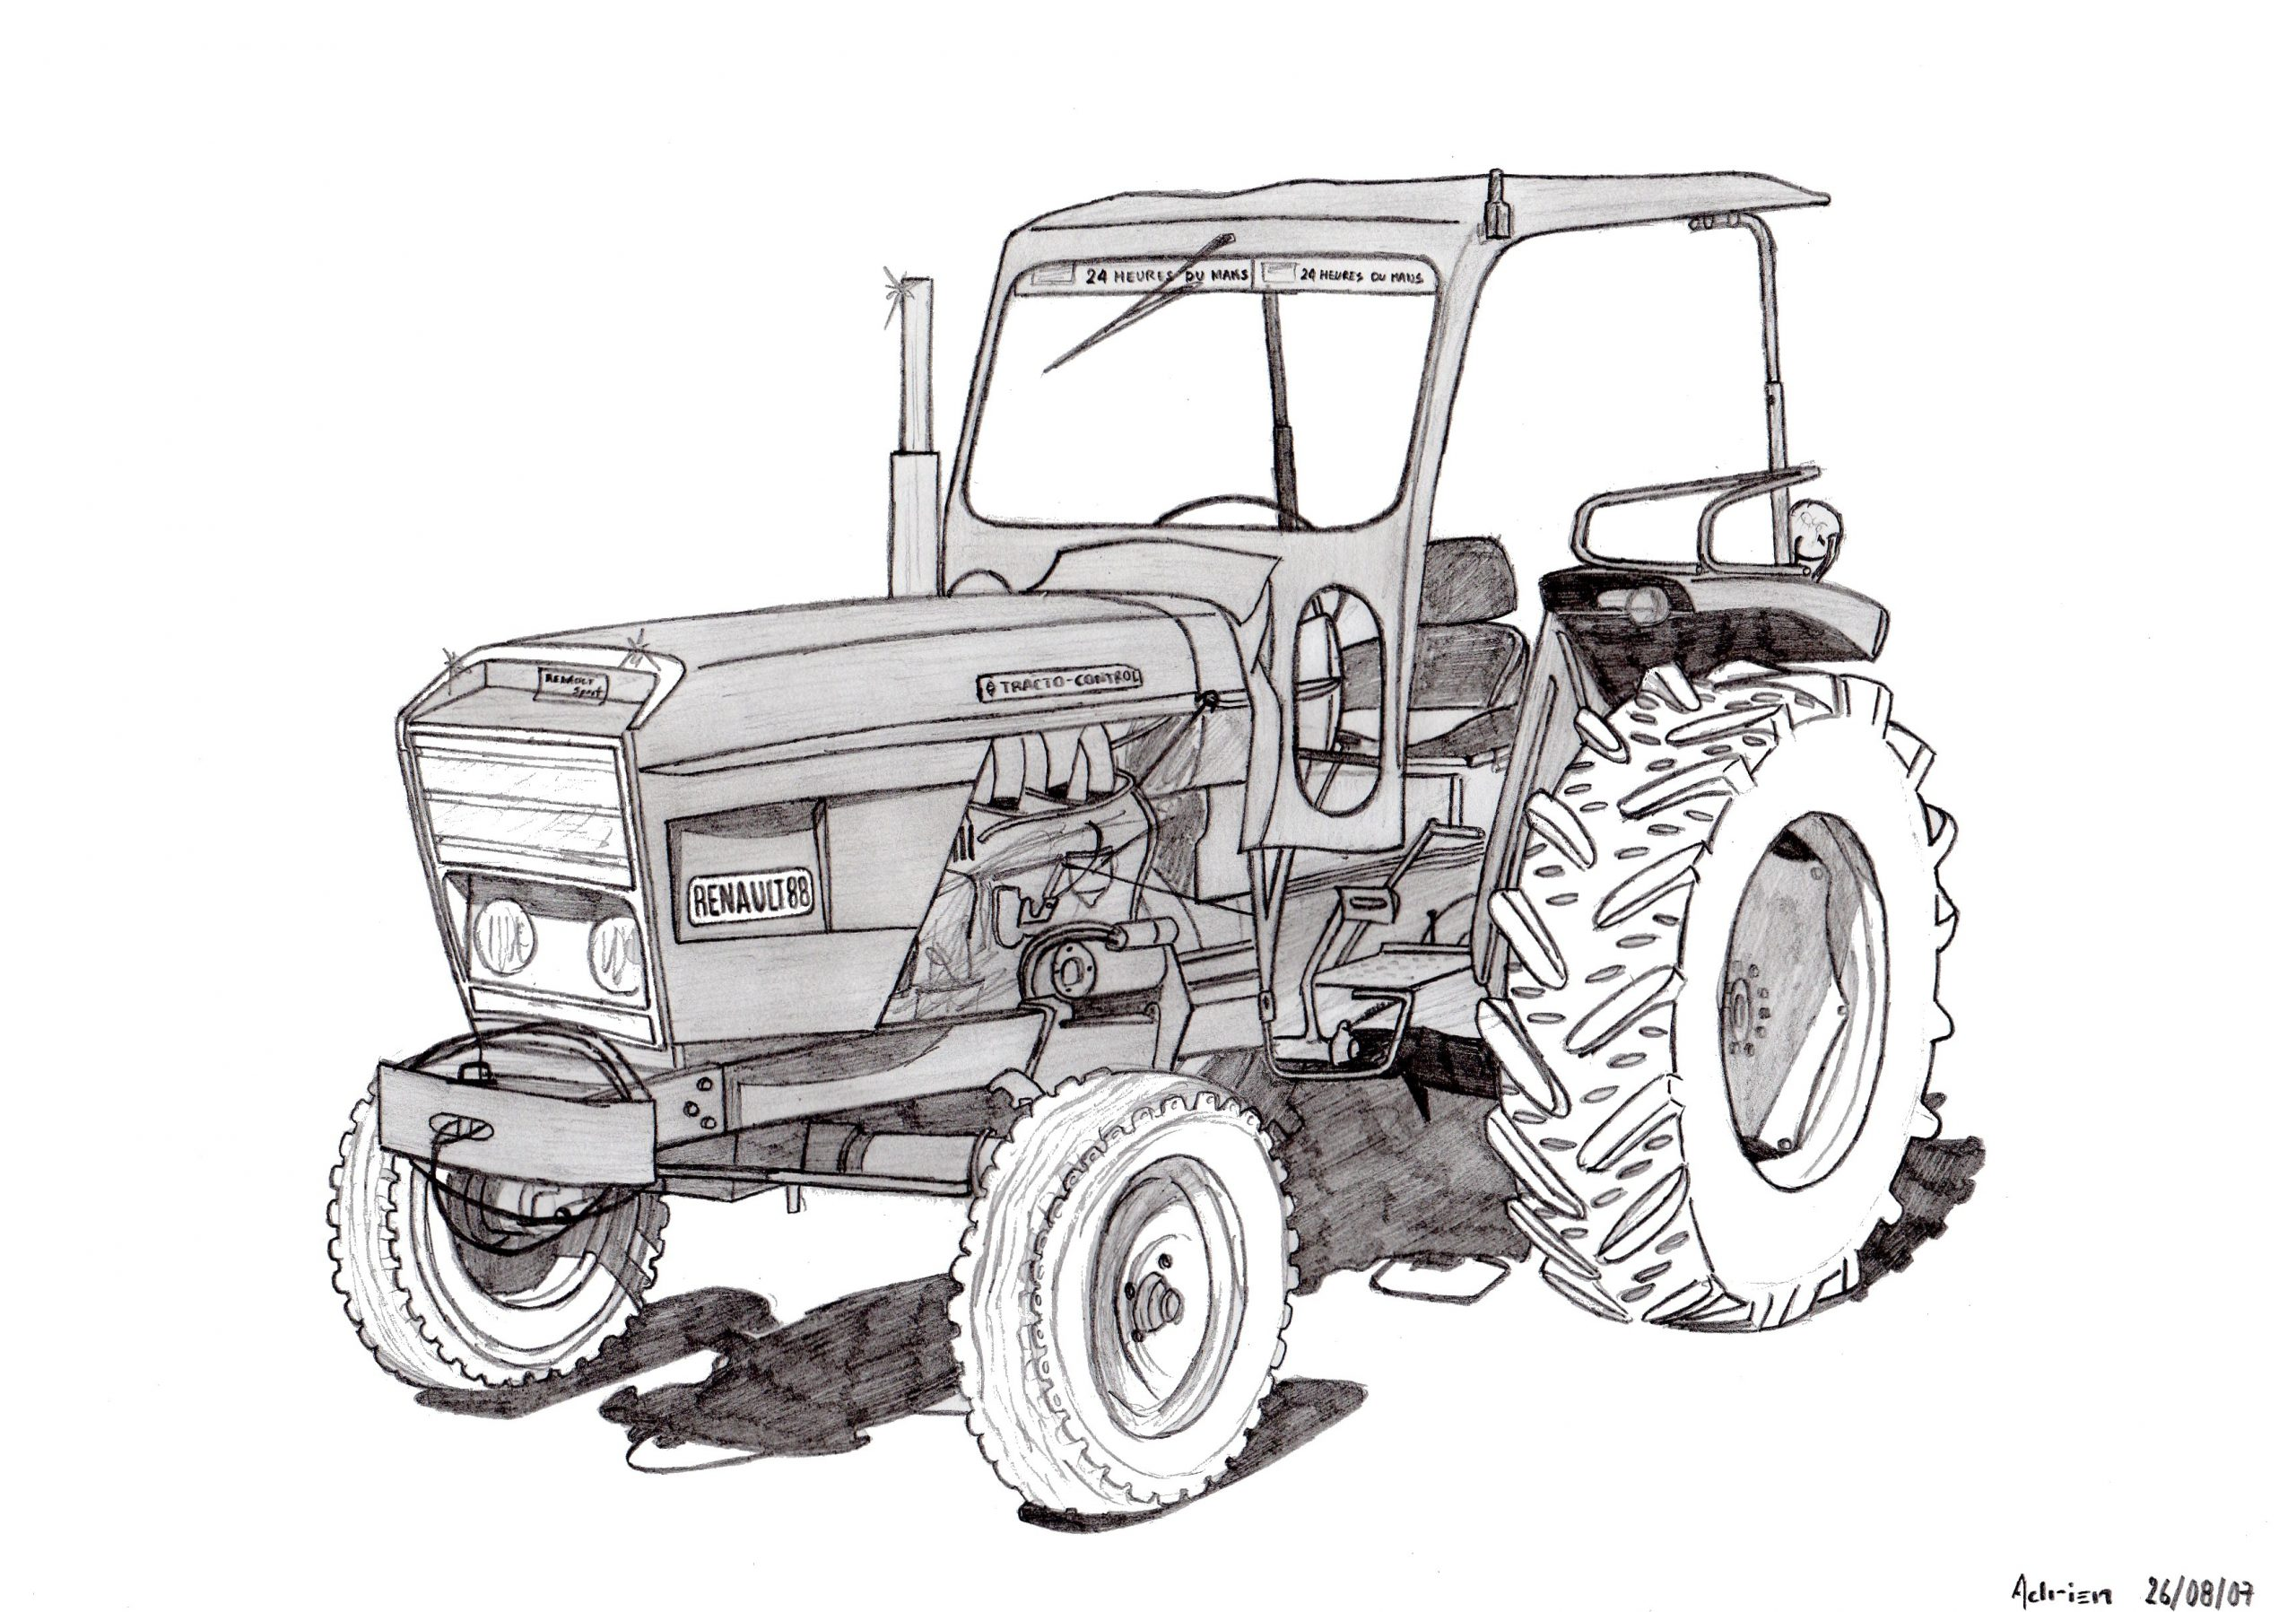 Dessin Imprimer Tracteur New Holland - Dernier H serapportantà Dessin Animé De Tracteur John Deere